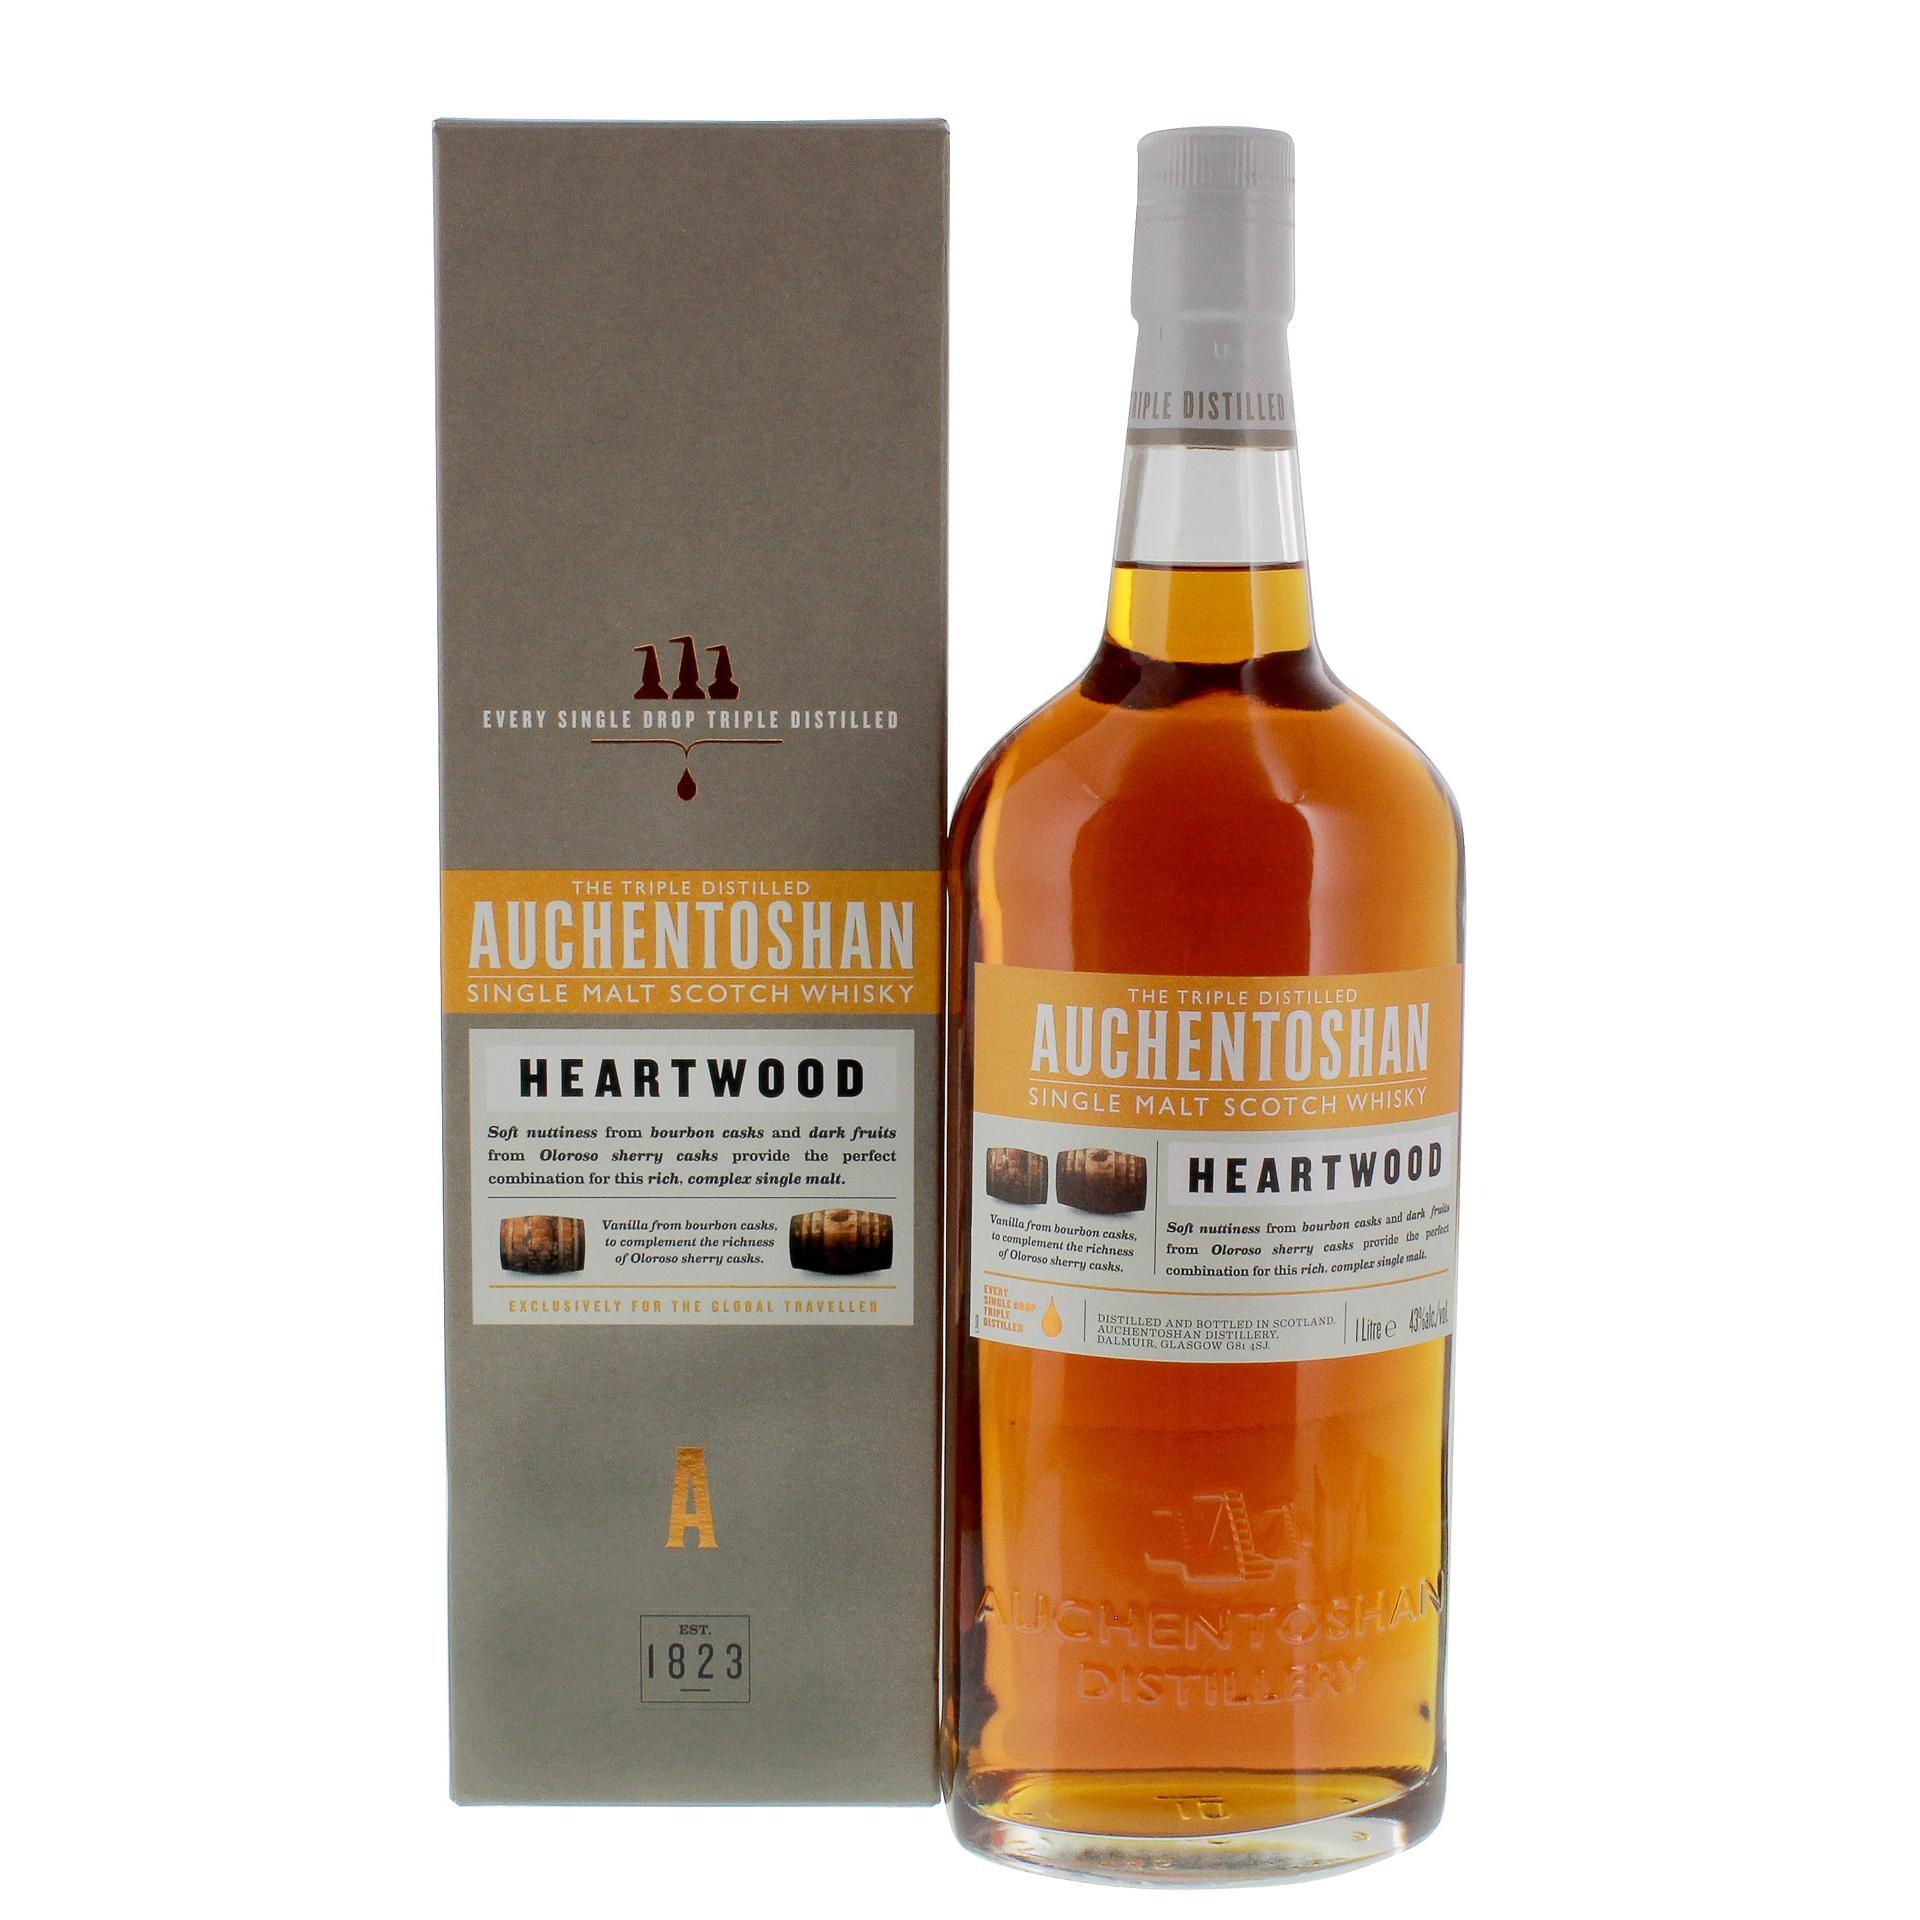 Auchentoshan Heartwood Single Malt Scotch Whisky 1l